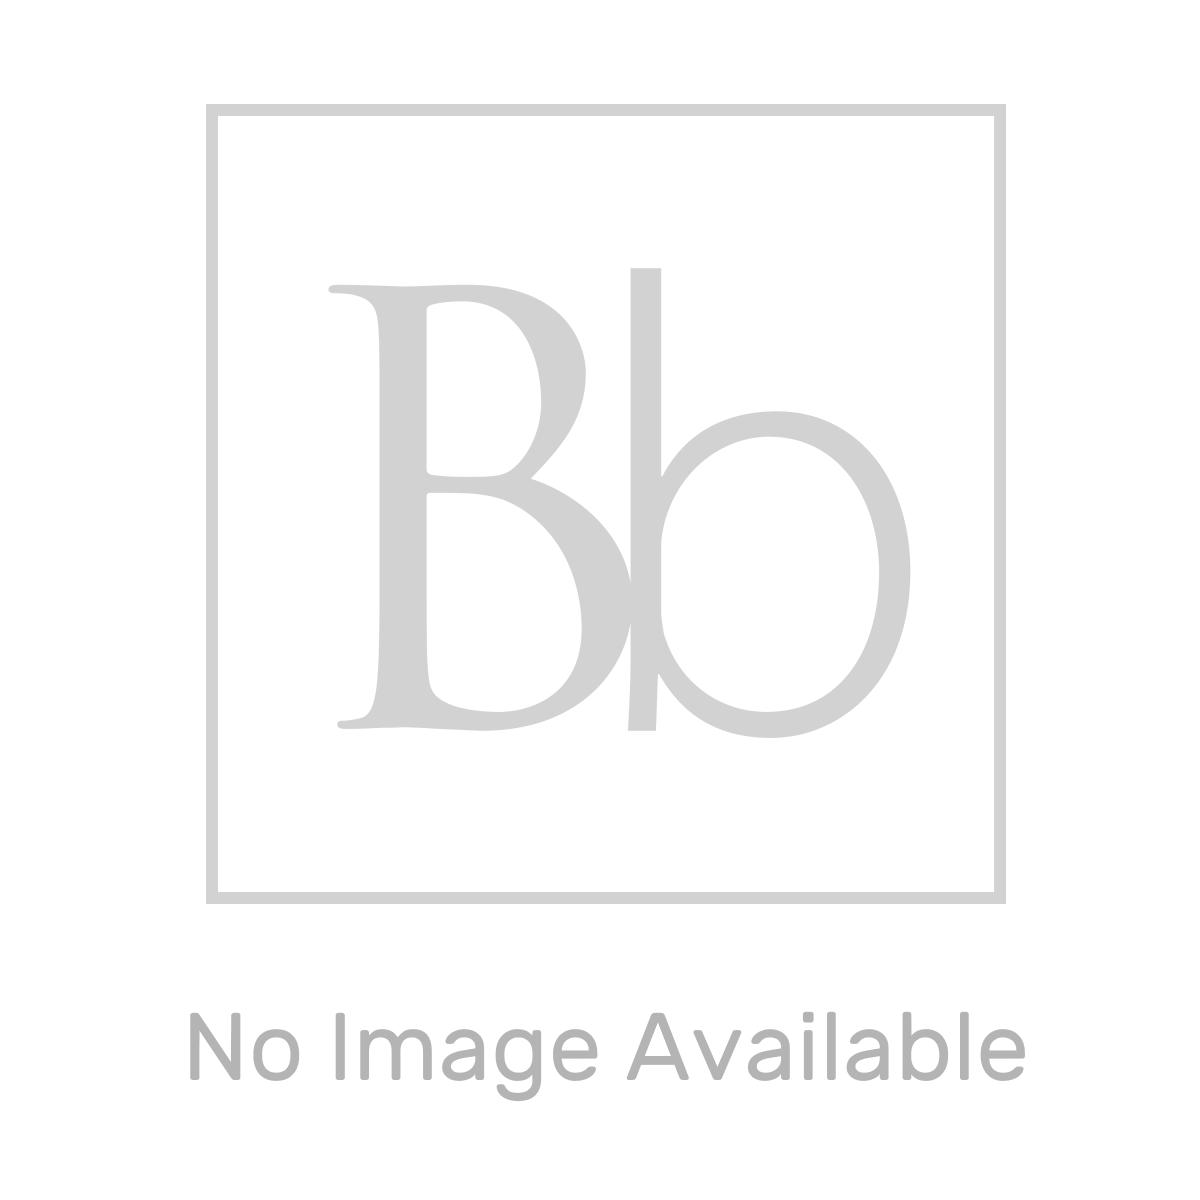 RAK Feeling Black Rectangular Shower Tray 1700 x 800mm Measurements